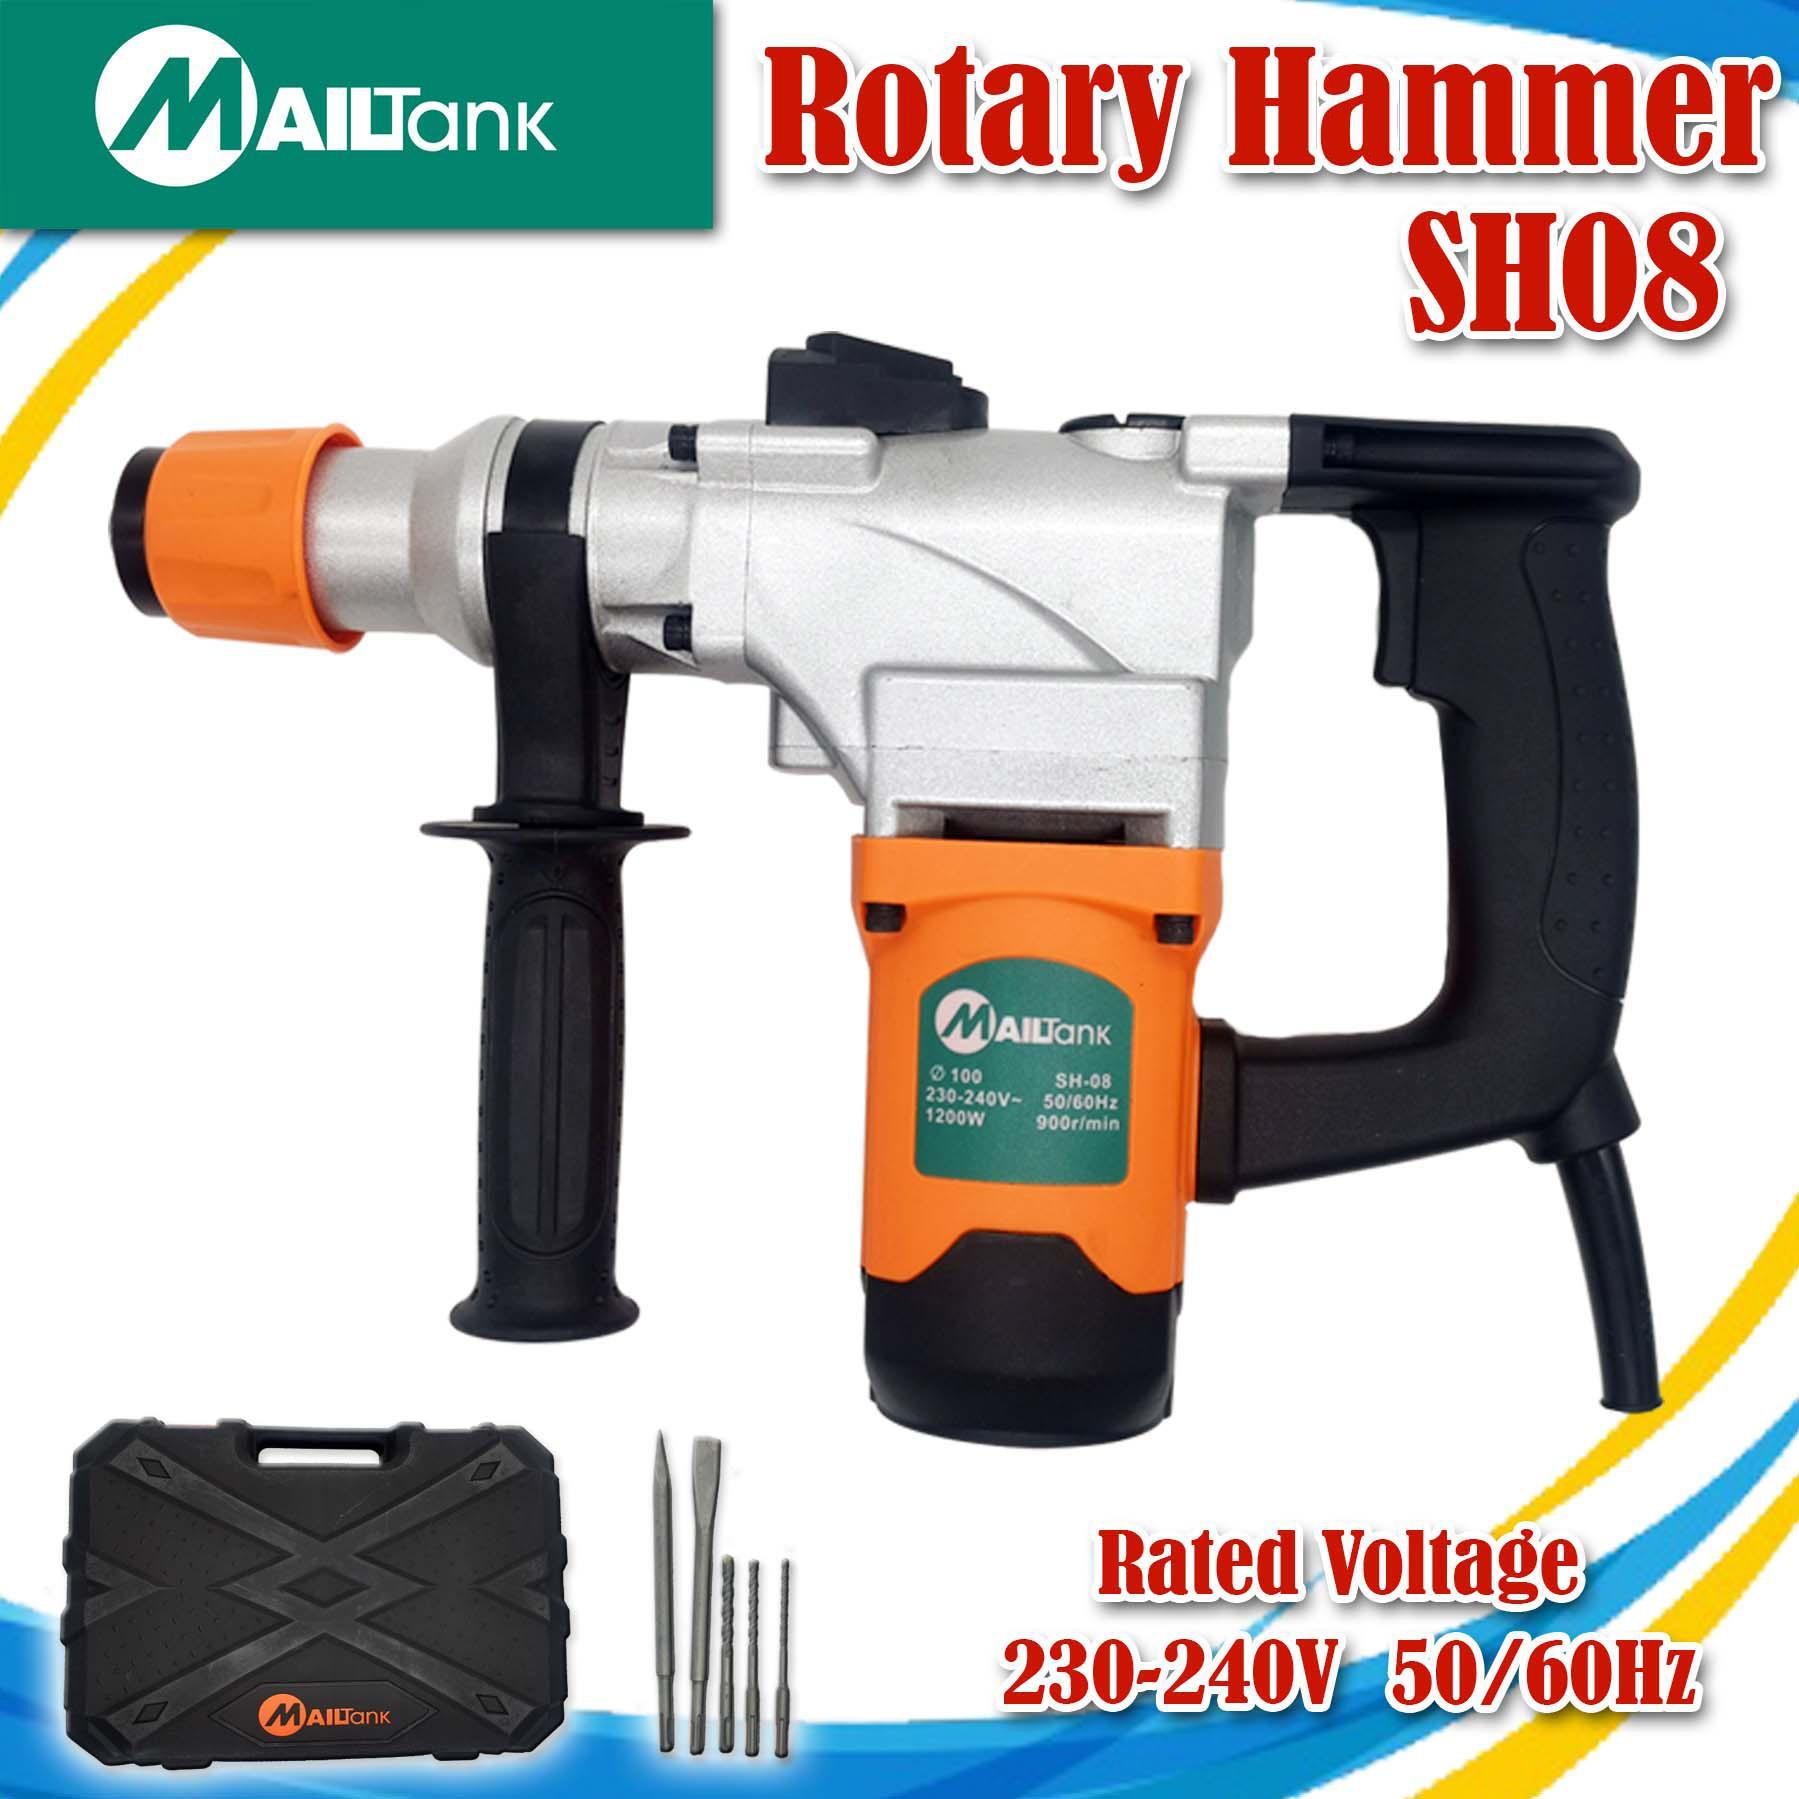 Demolition Hammer for sale - Concrete Breaker prices, brands